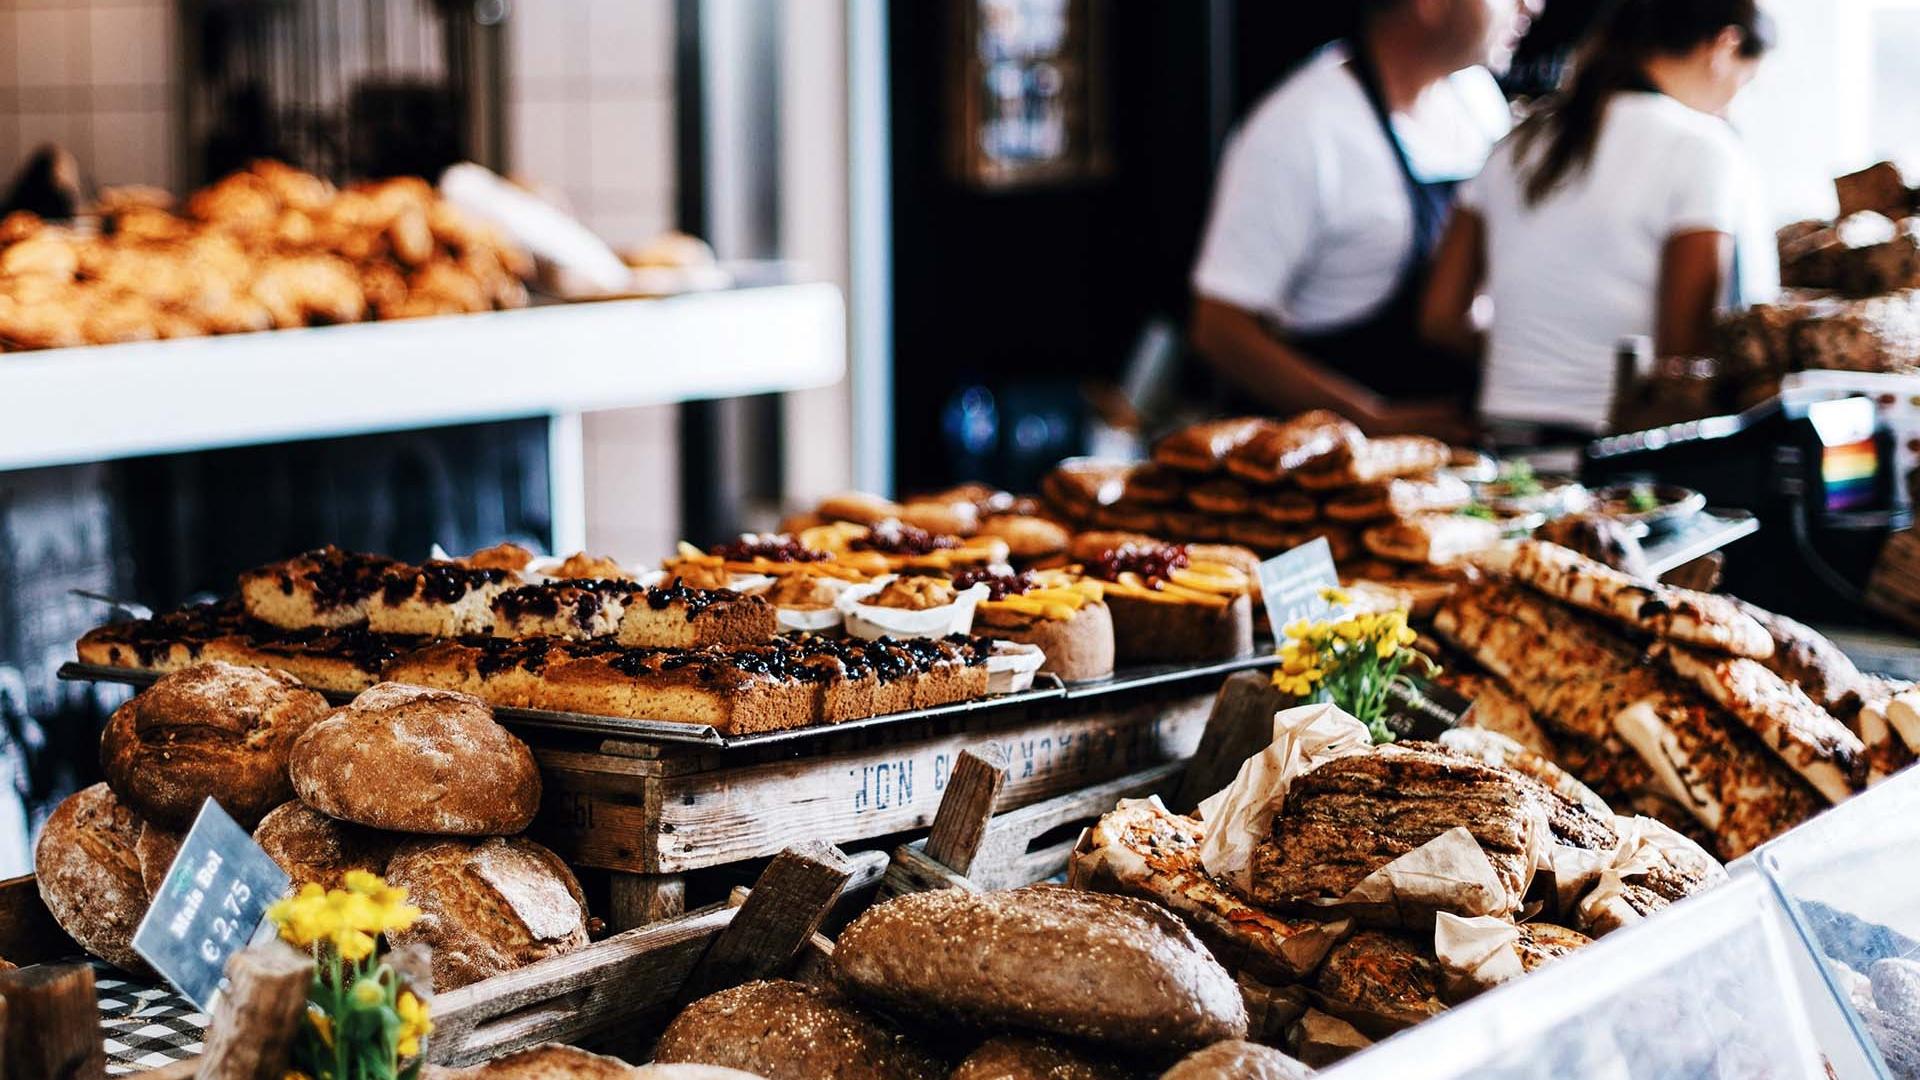 Gluten free bakery in Paris